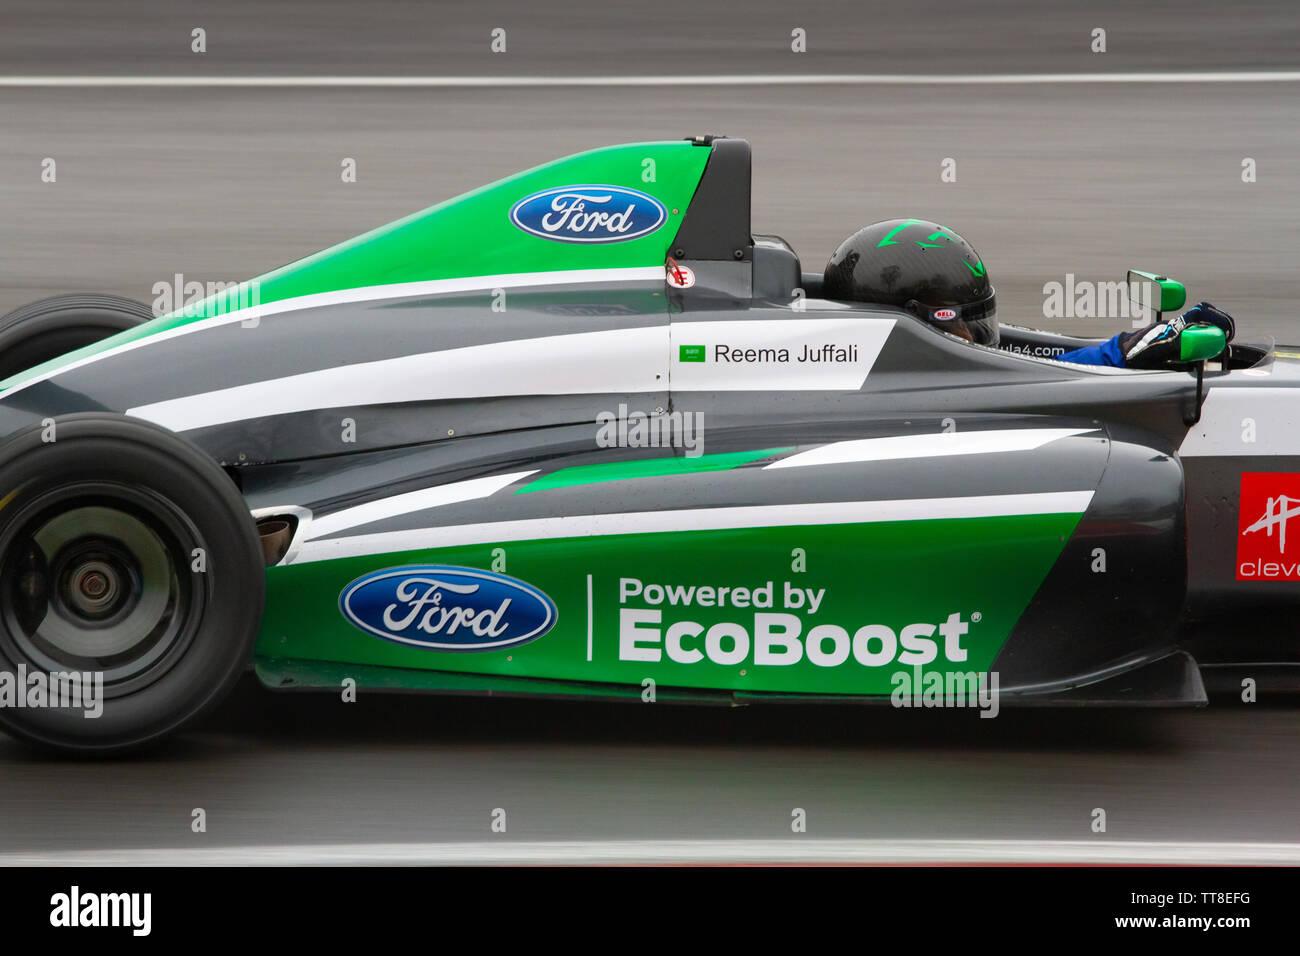 Reema Juffali, the first woman racing driver from Saudi Arabia. British Formula 4, Brands Hatch - Stock Image